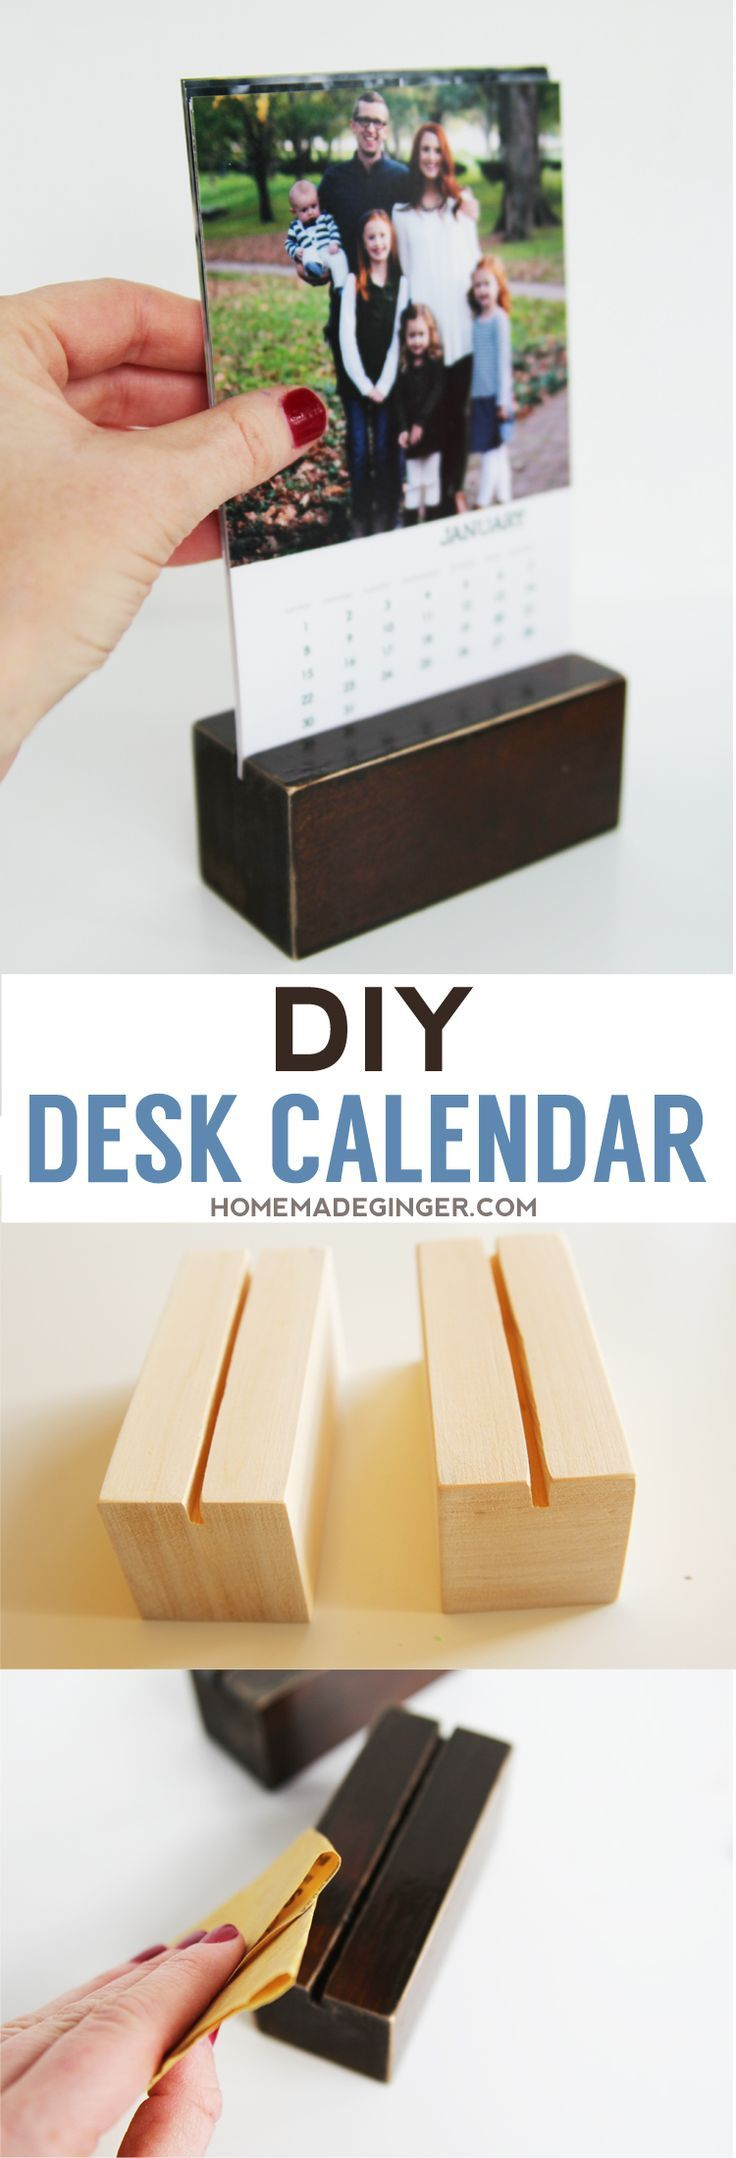 Diy Table Calendar : Best images about diy on pinterest headboards